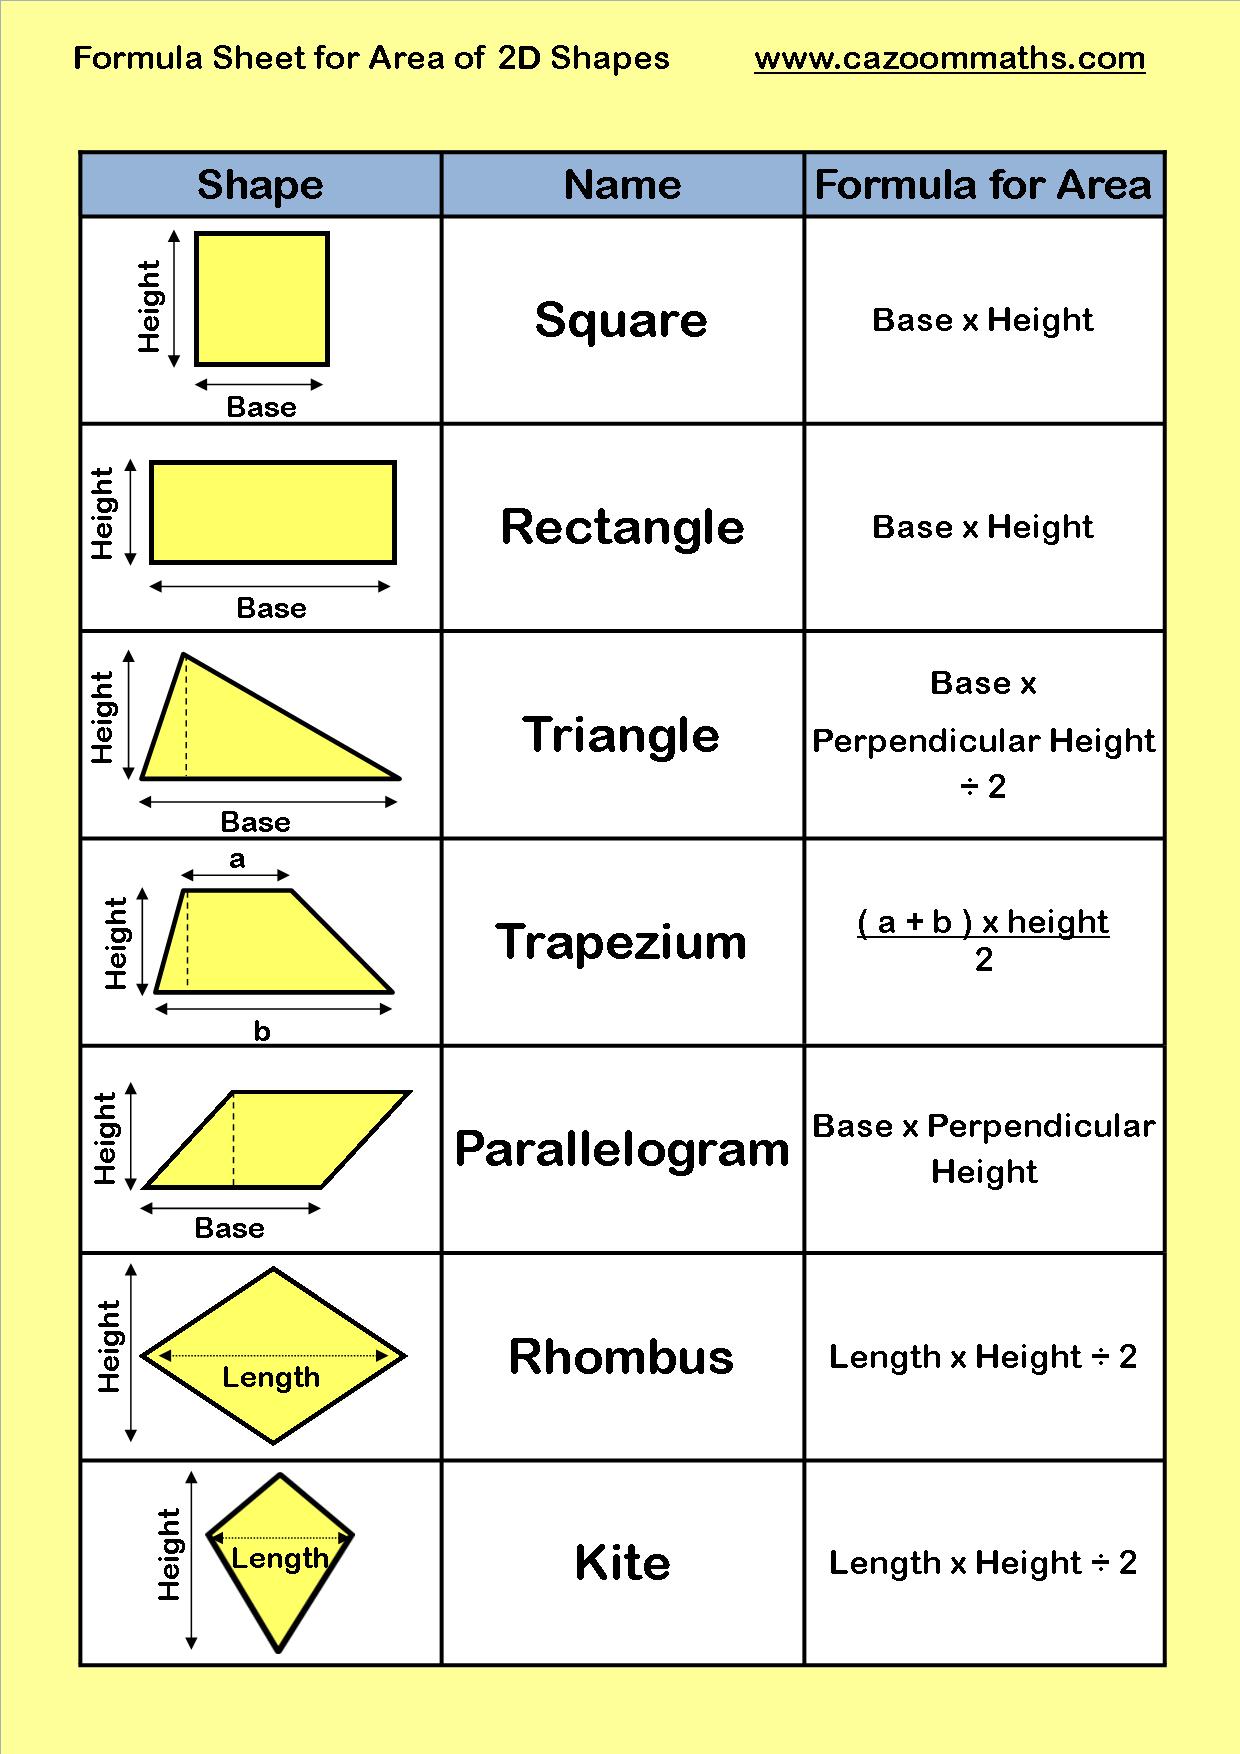 Formula Sheet For Area Of 2d Shapes